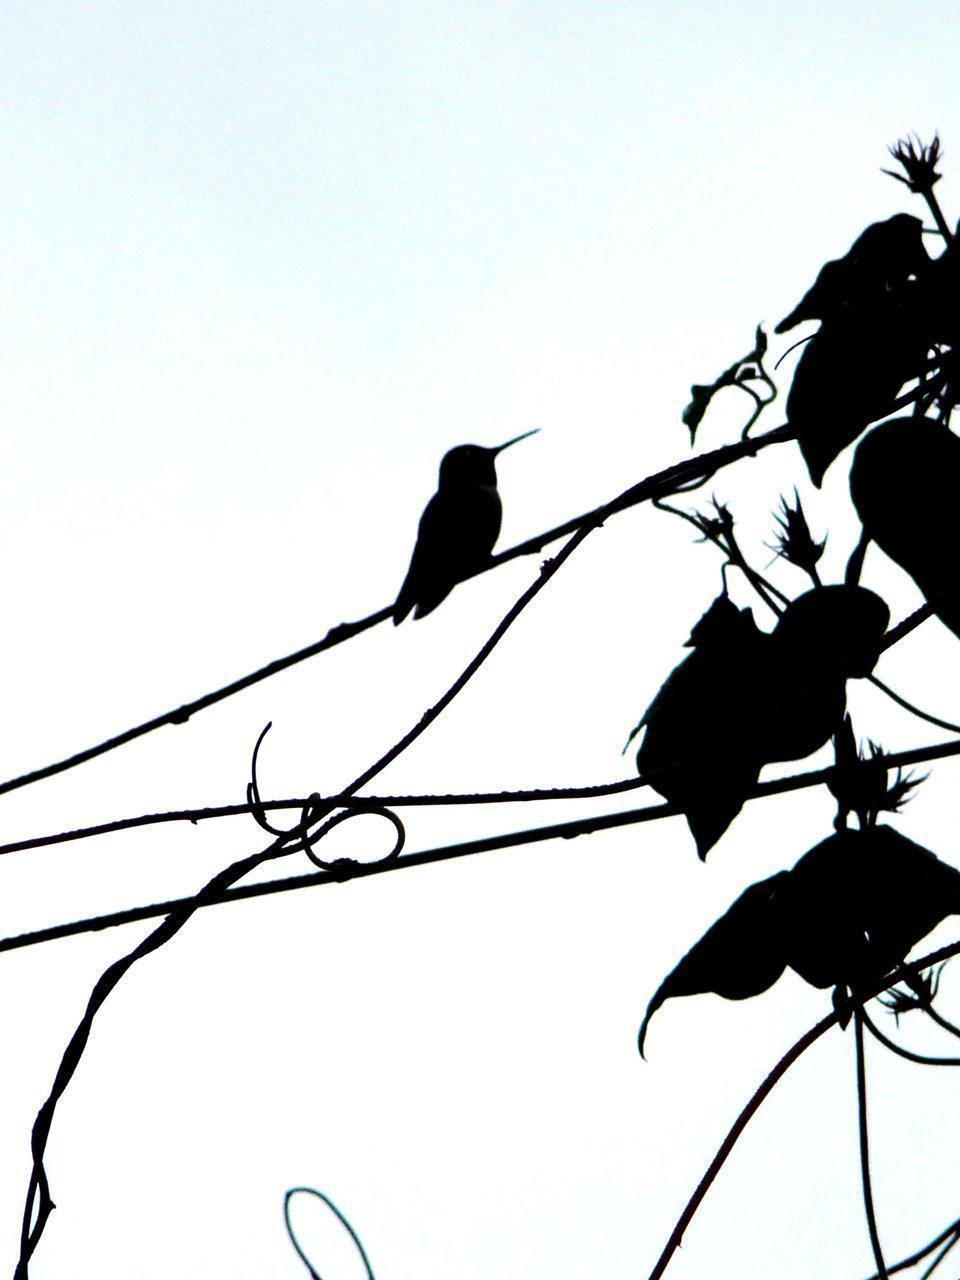 960x1280 Free Hummingbird Silhouette Clip Art